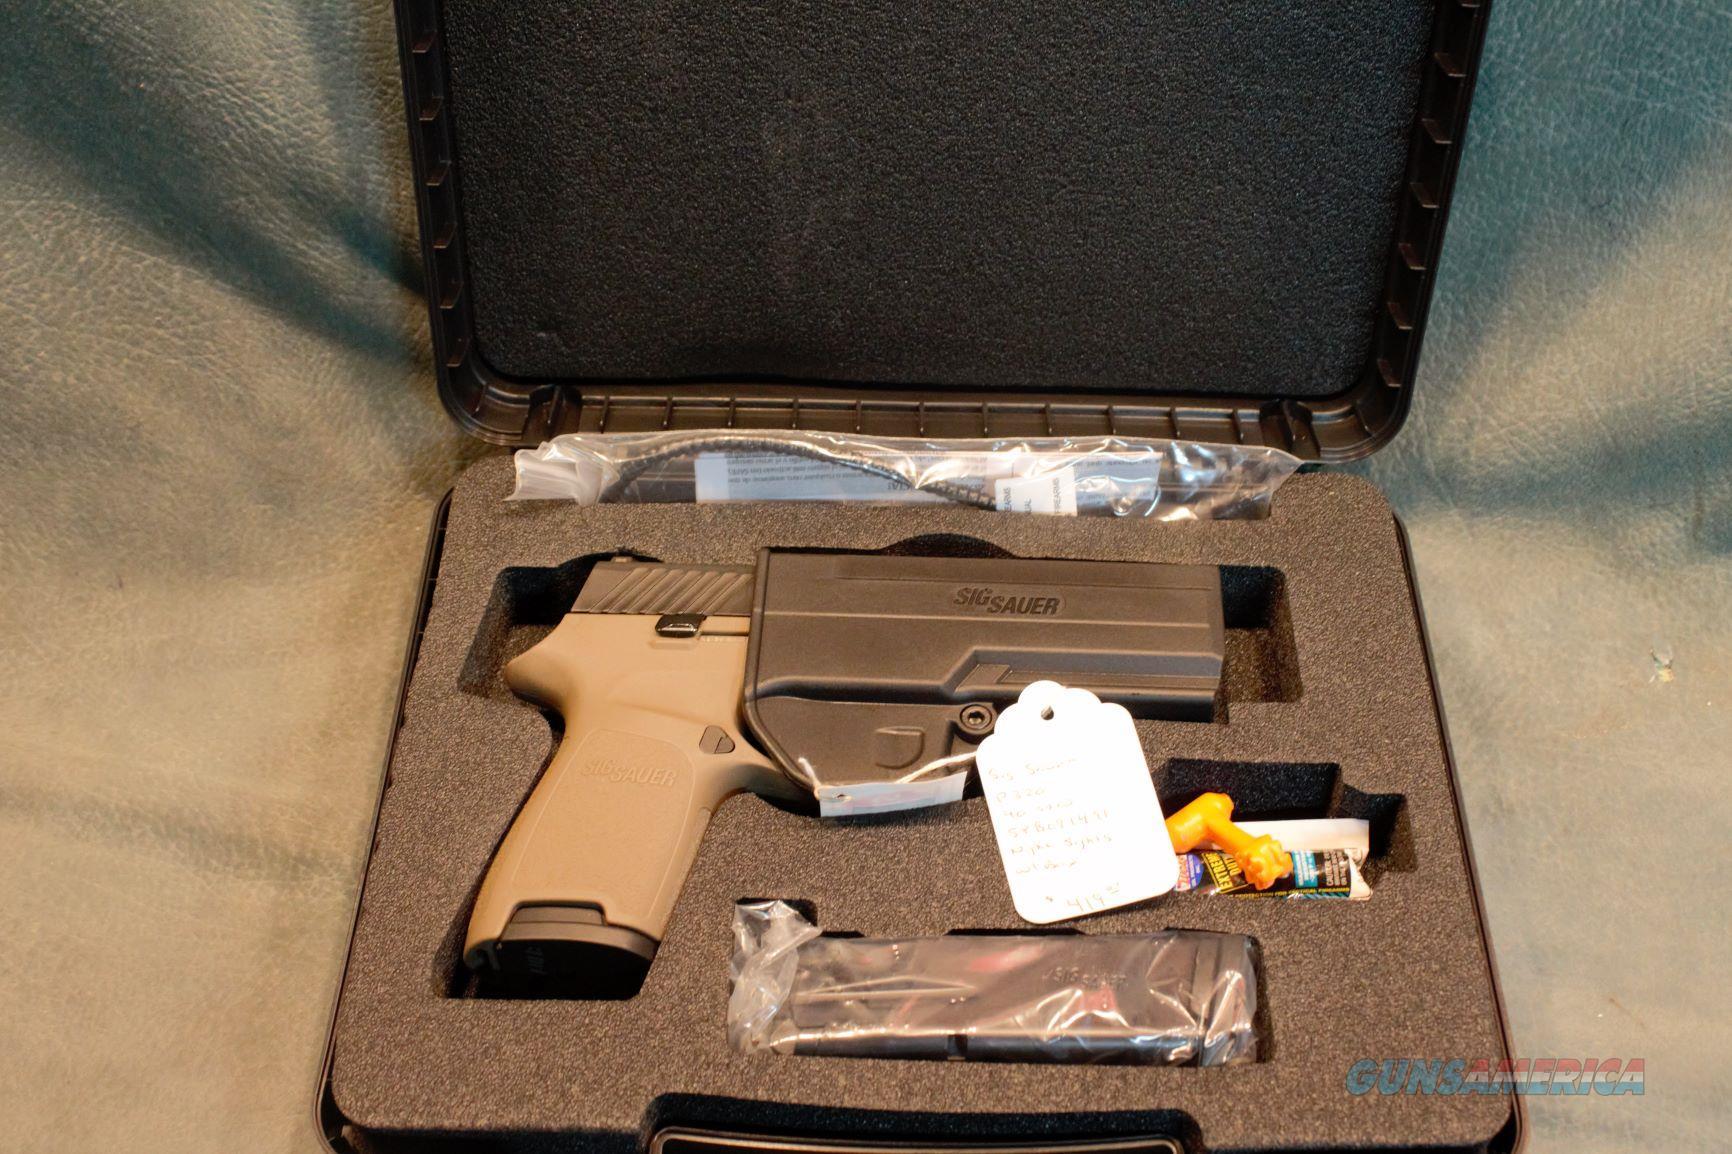 Sig Sauer P320 FDE 40 S&W  Guns > Pistols > Sig - Sauer/Sigarms Pistols > P320